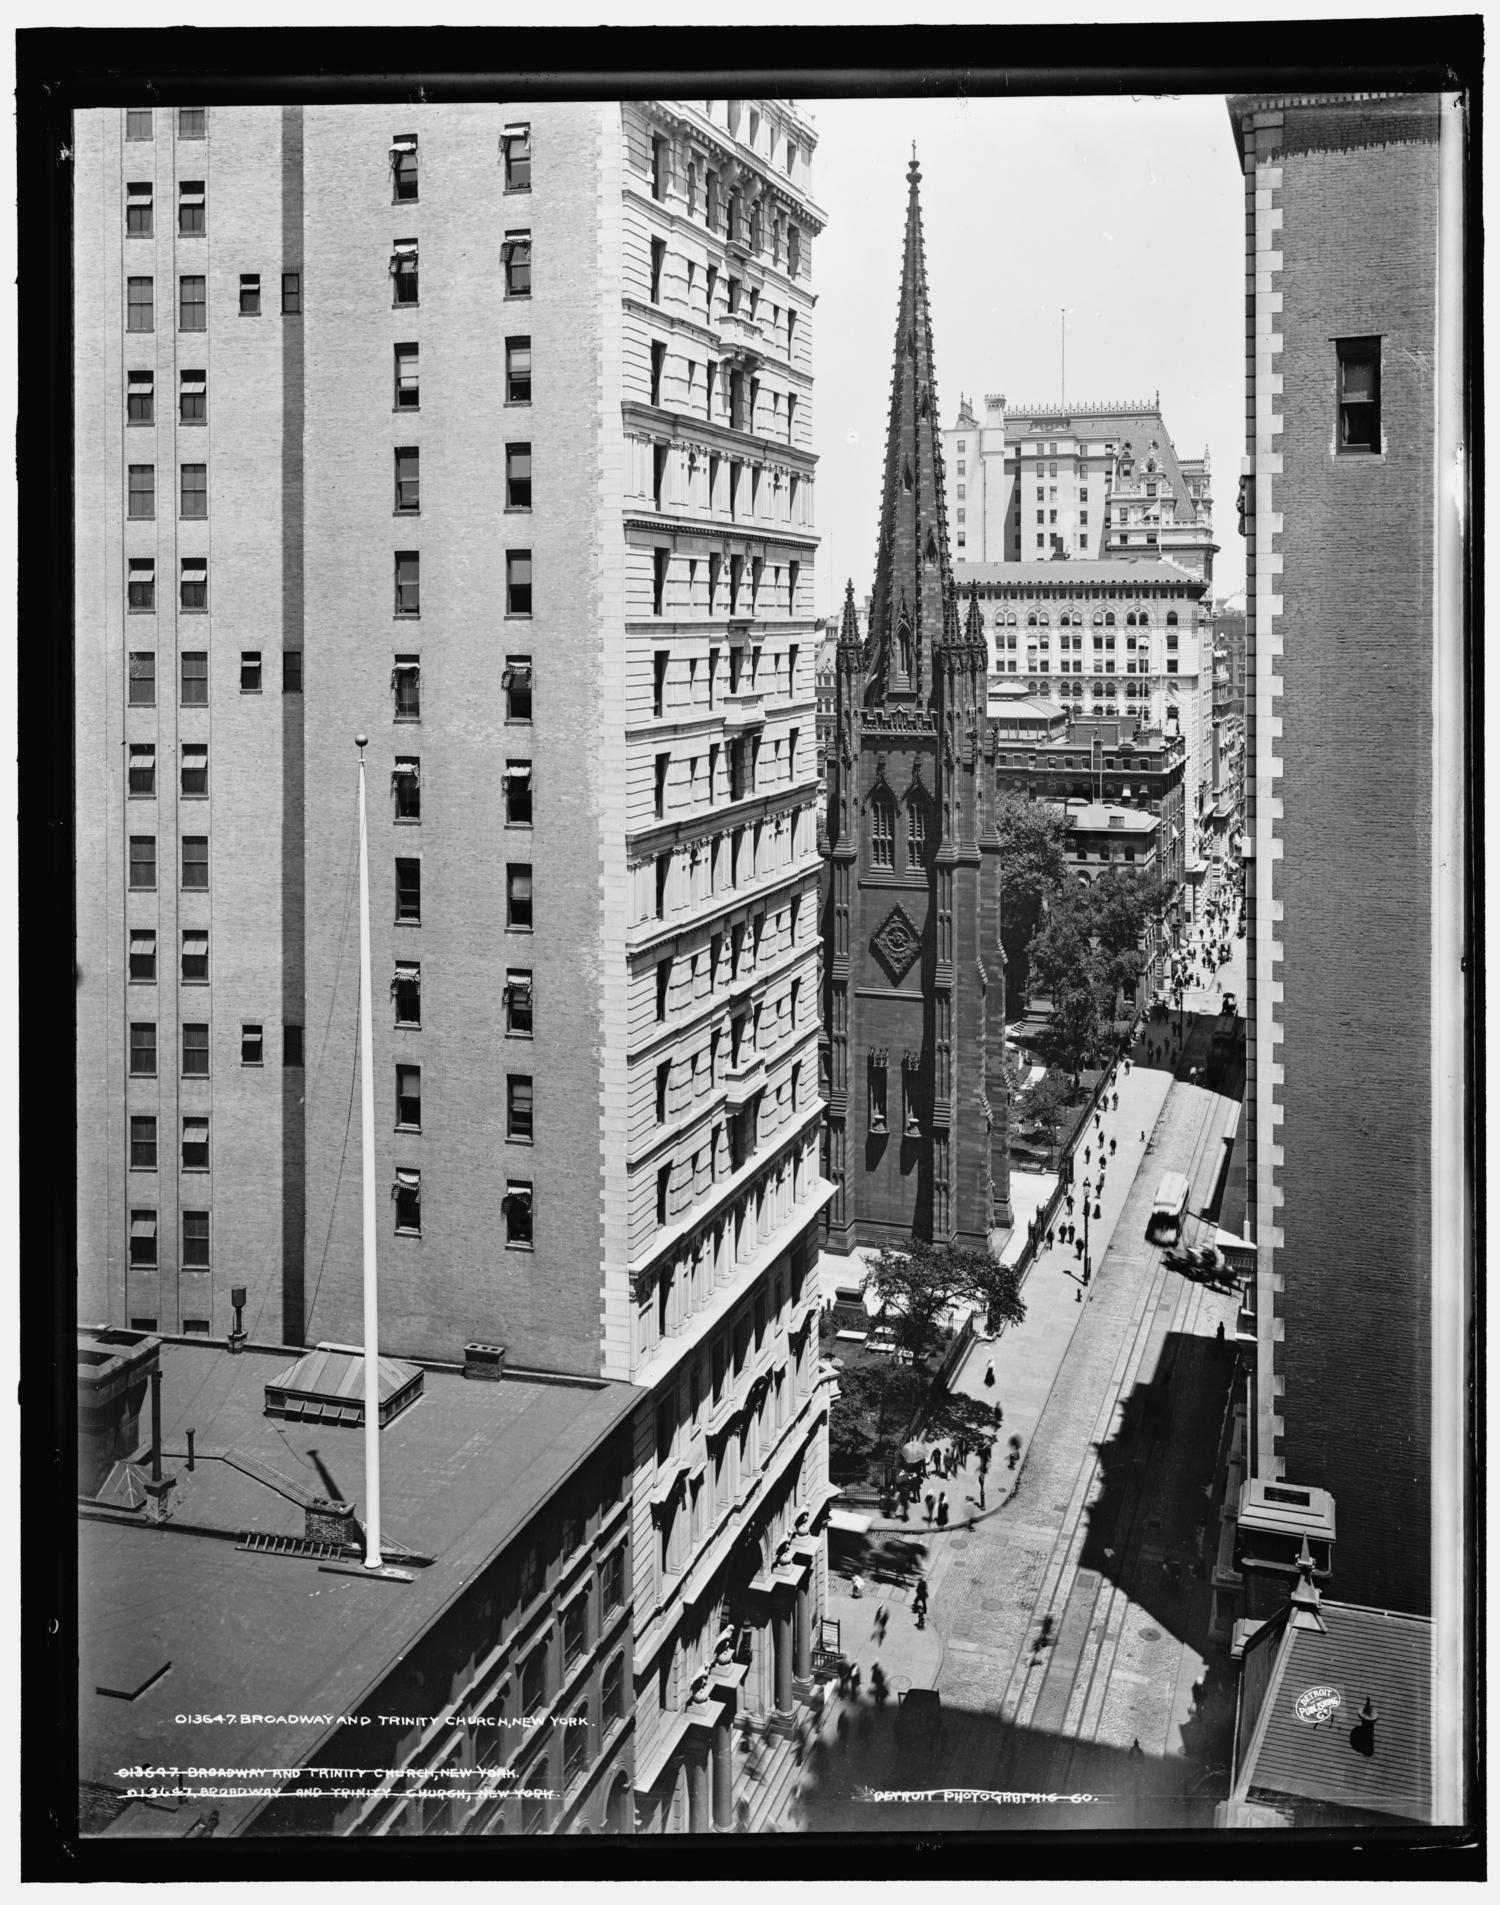 Broadway and Trinity Church, New York ca. 1900